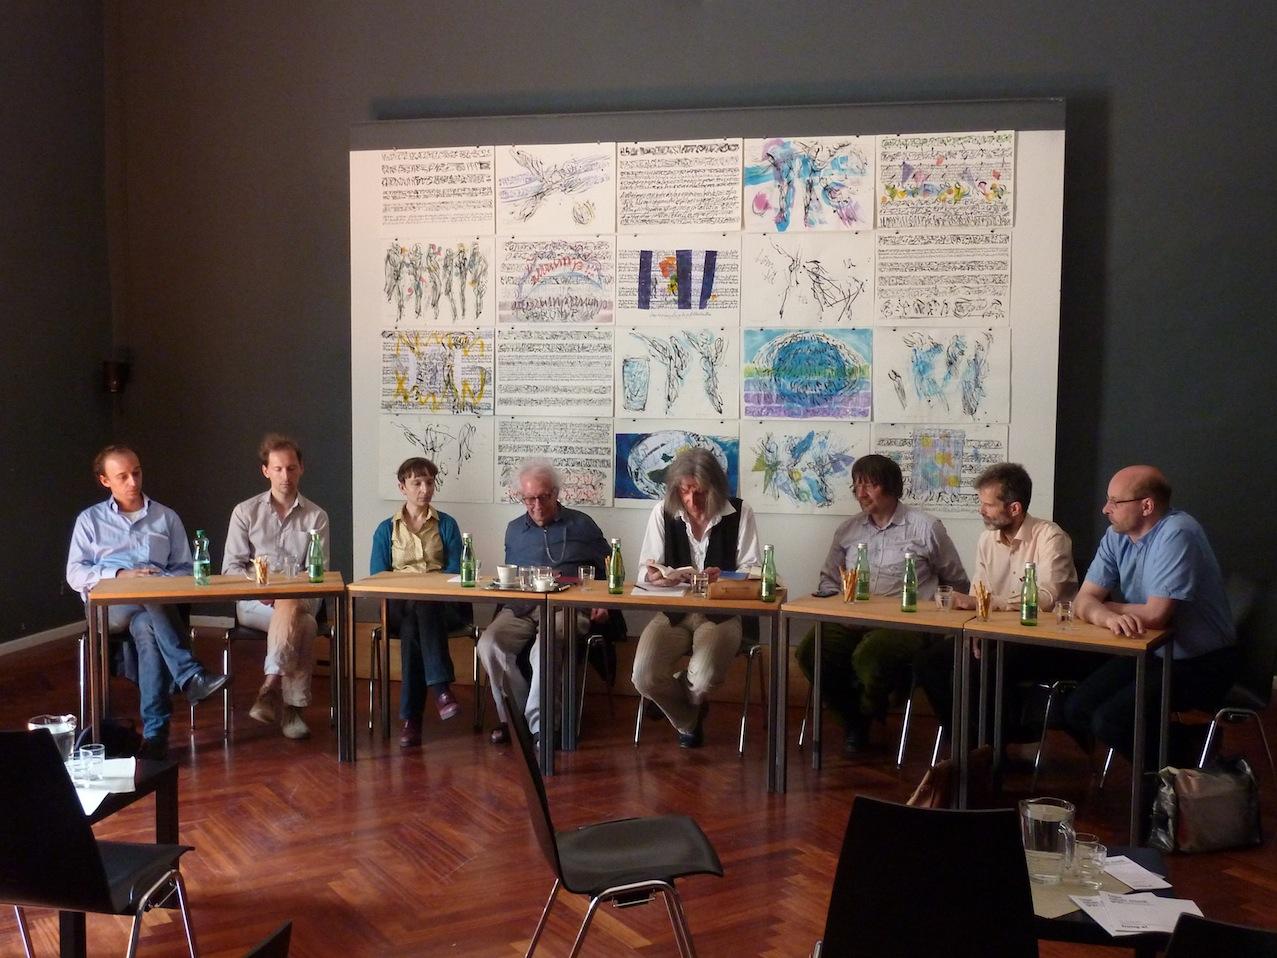 Thomas Wally, Reinhold Schinwald, Ariane Jeßulat, Dieter Schnebel, Clemens Nachtmann, Winfried Ritsch, Klaus Dorfegger, Frank Wörner © D. Mayer